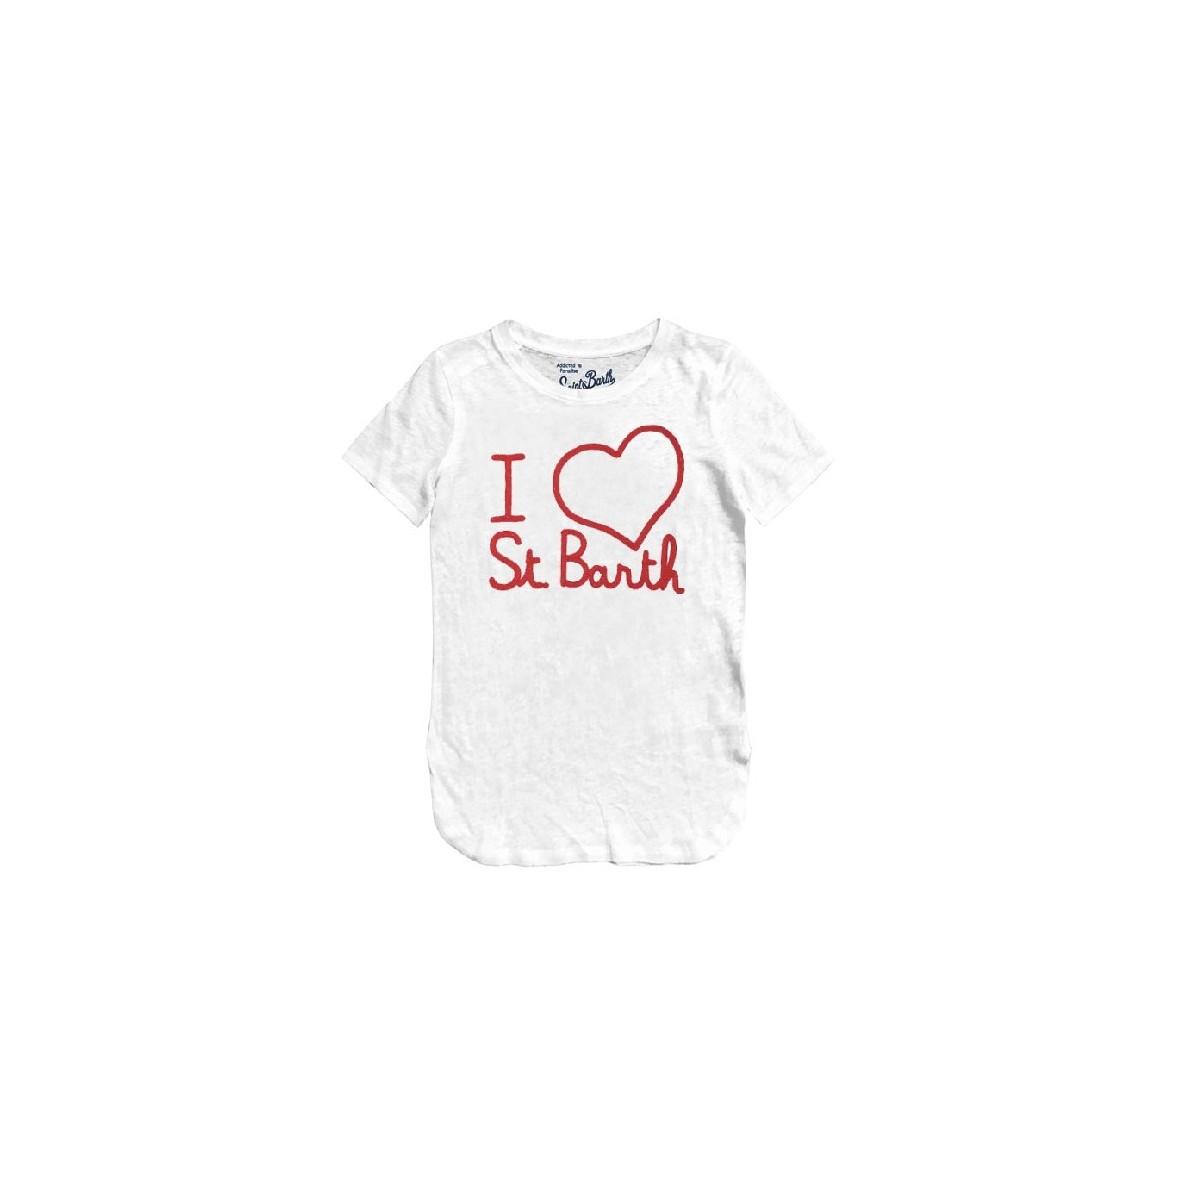 T-shirt - Scarlett t-shirt ws